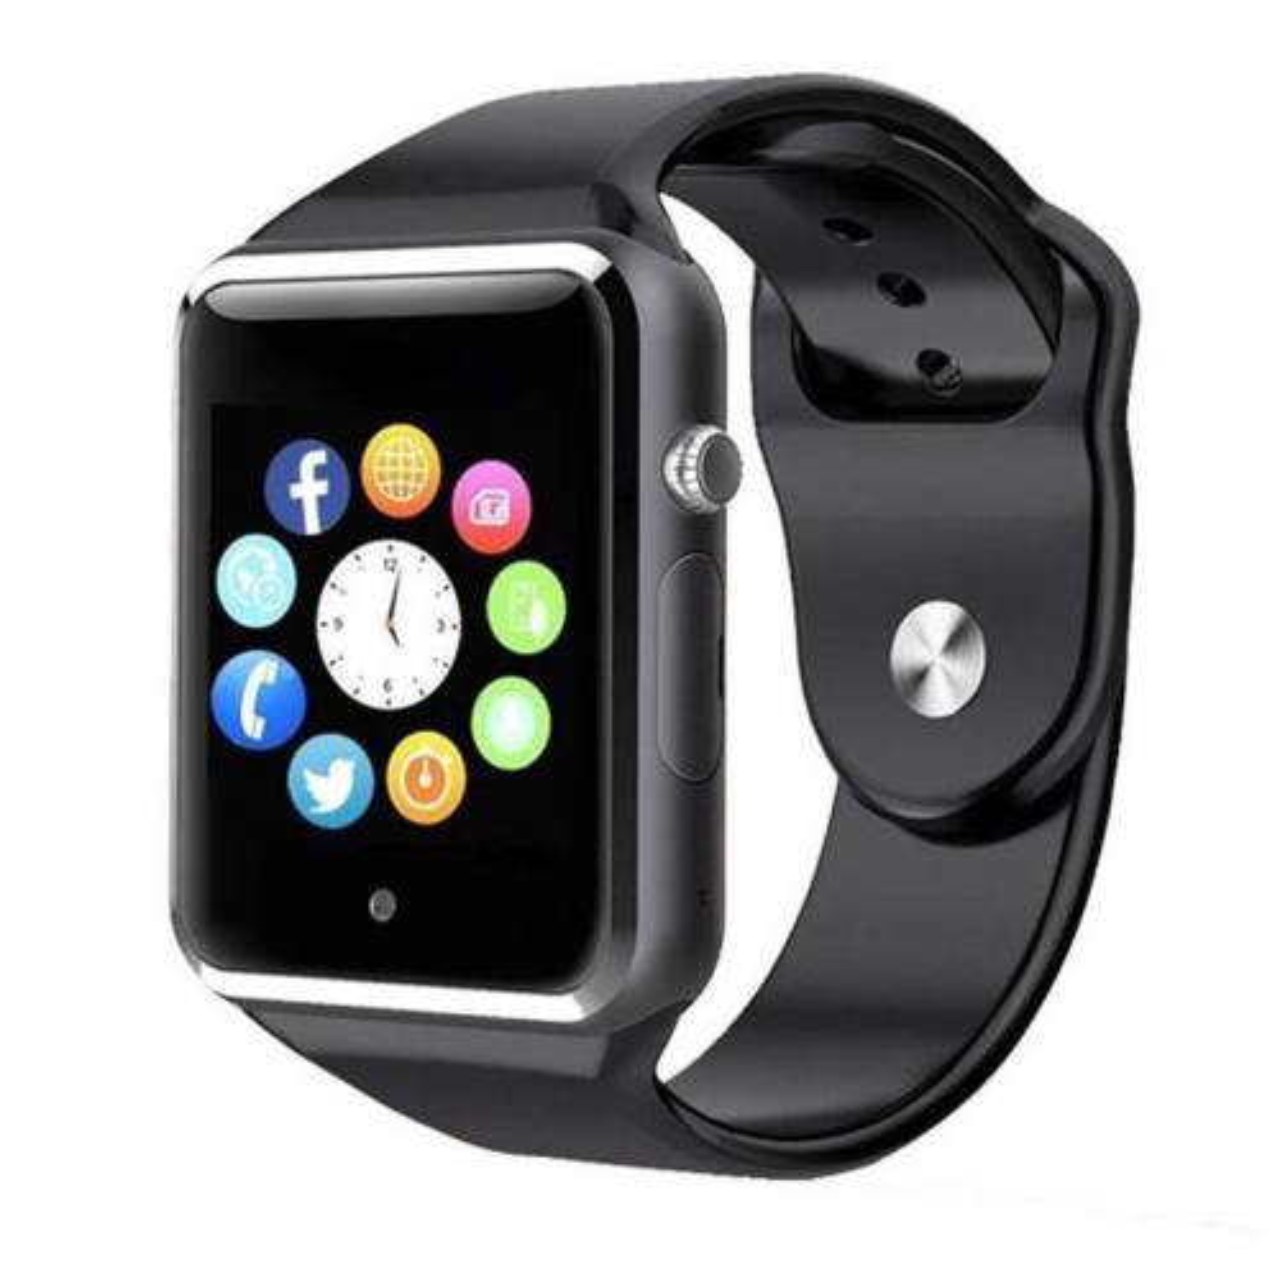 ساعت هوشمند تی سریز مدل A1